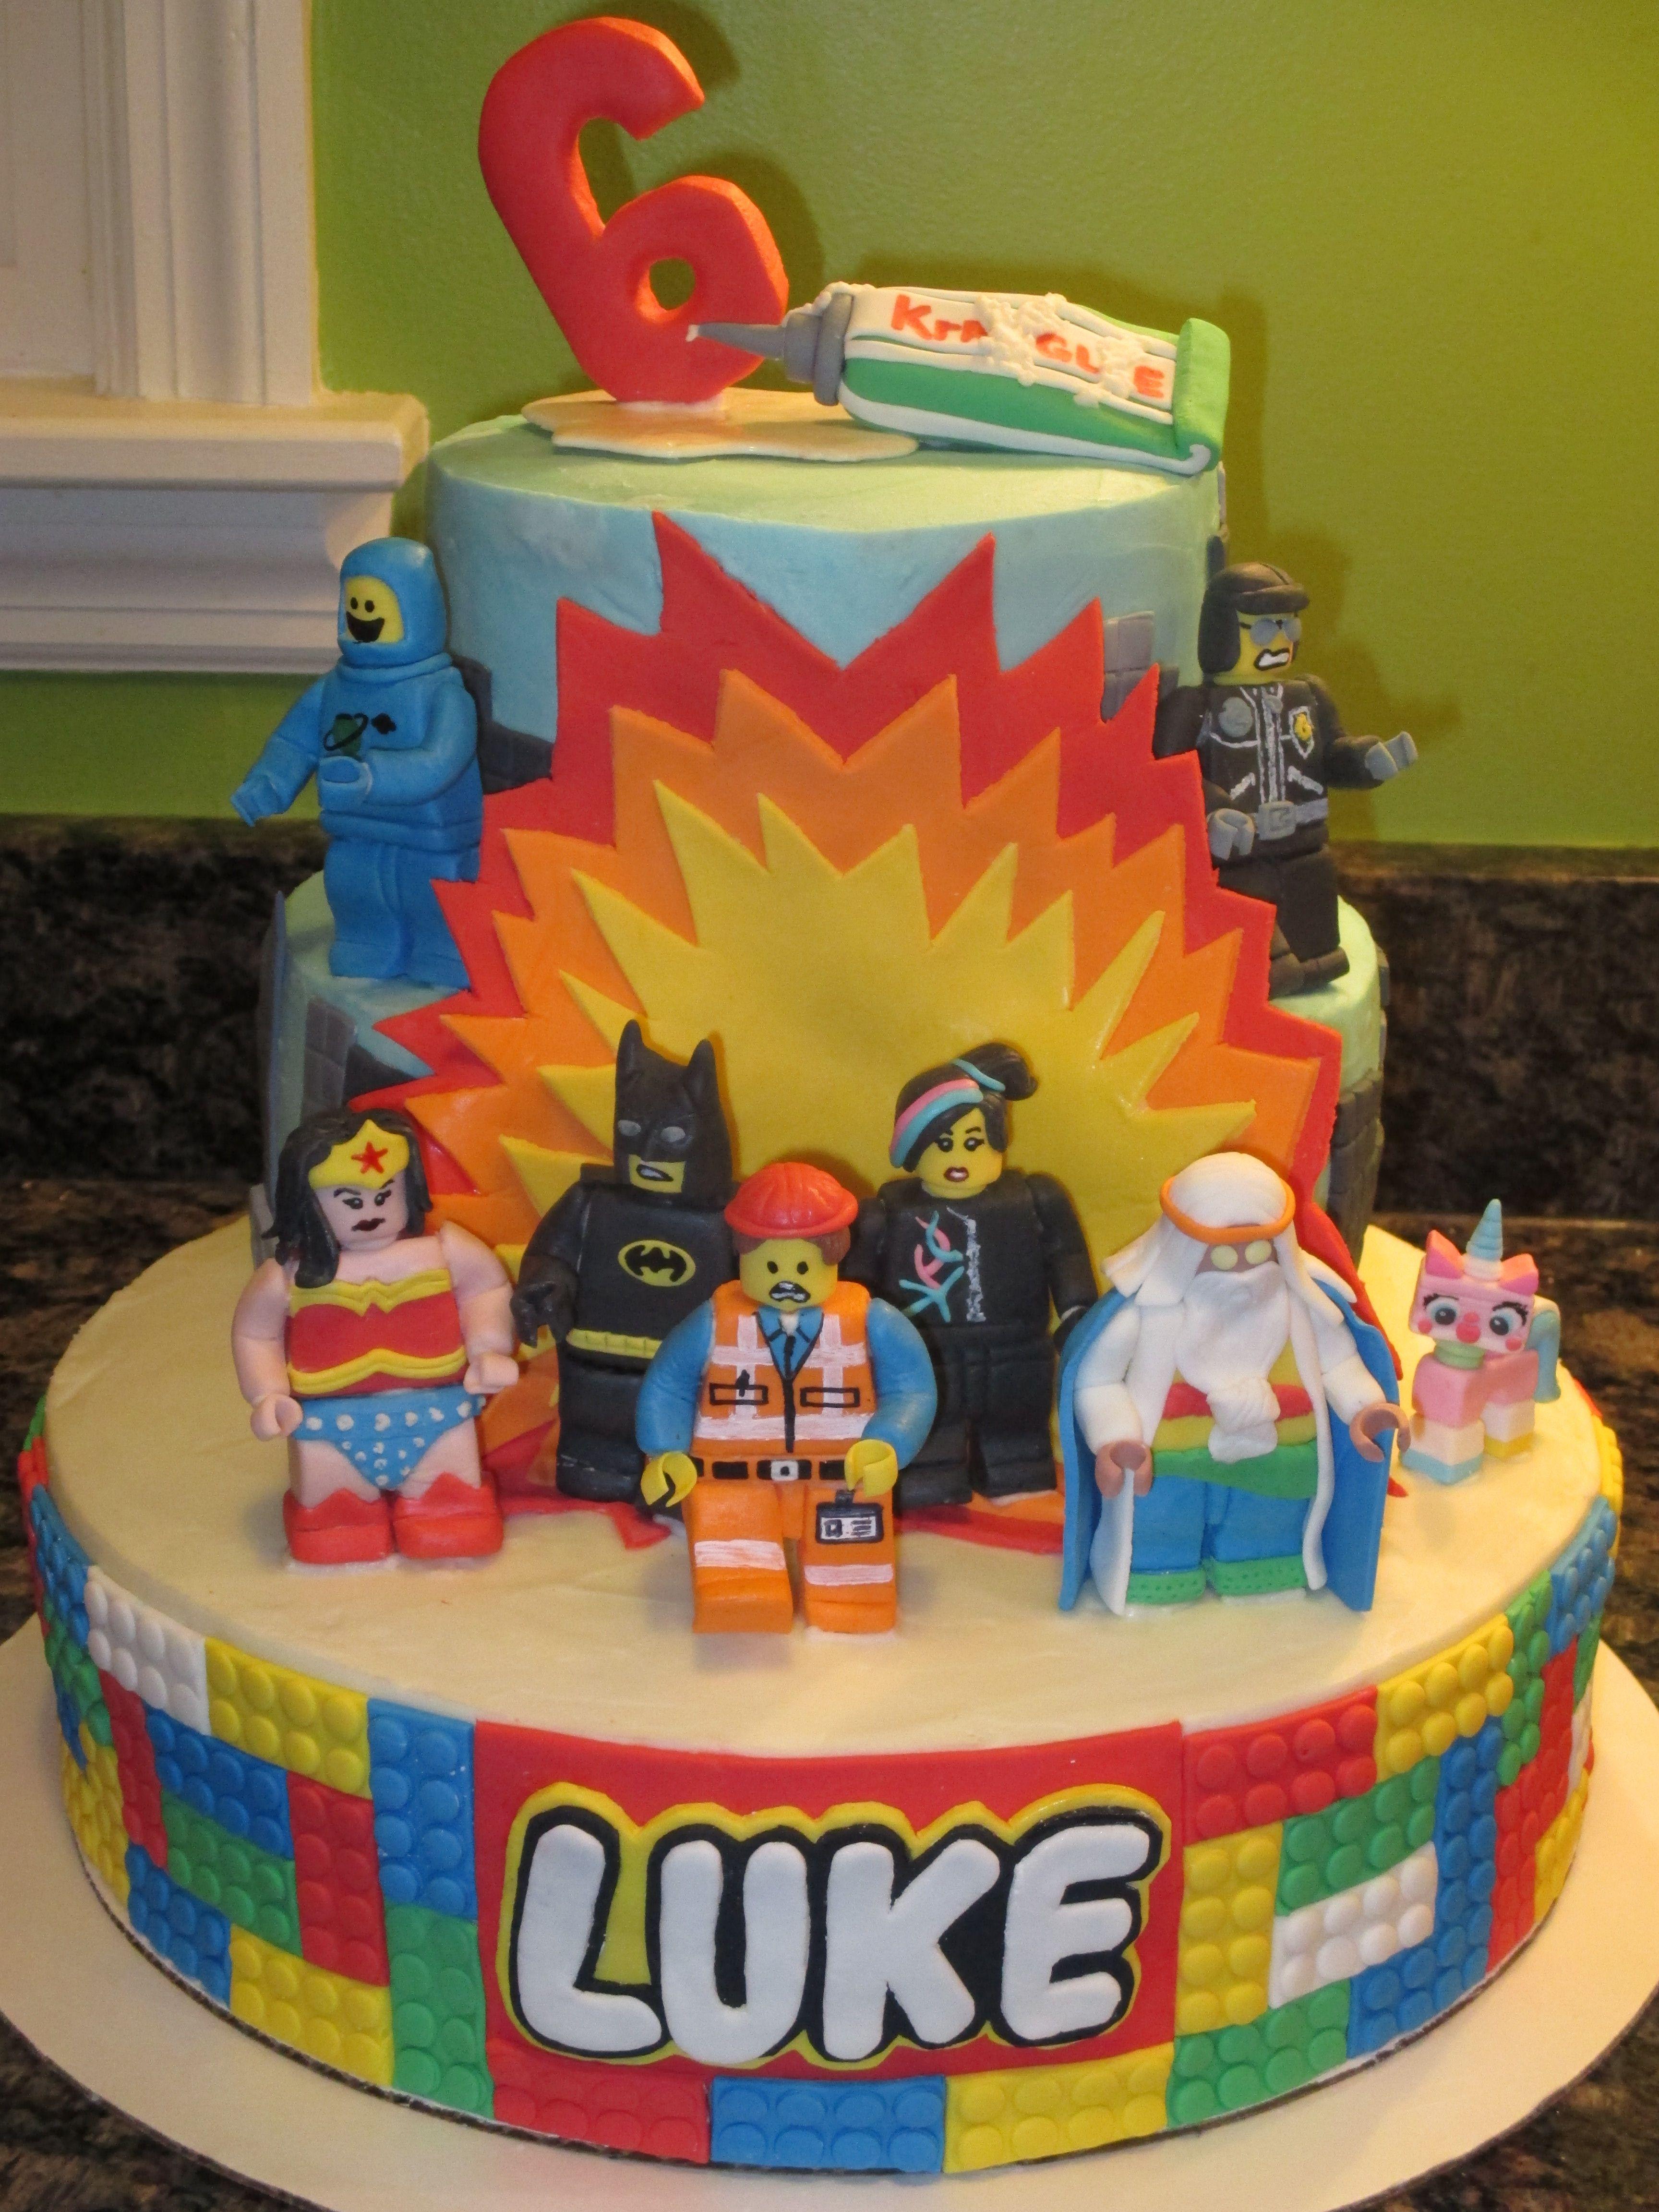 Superb Lego Movie Cake All Figures Are Fondant Lego Movie Birthday Birthday Cards Printable Trancafe Filternl